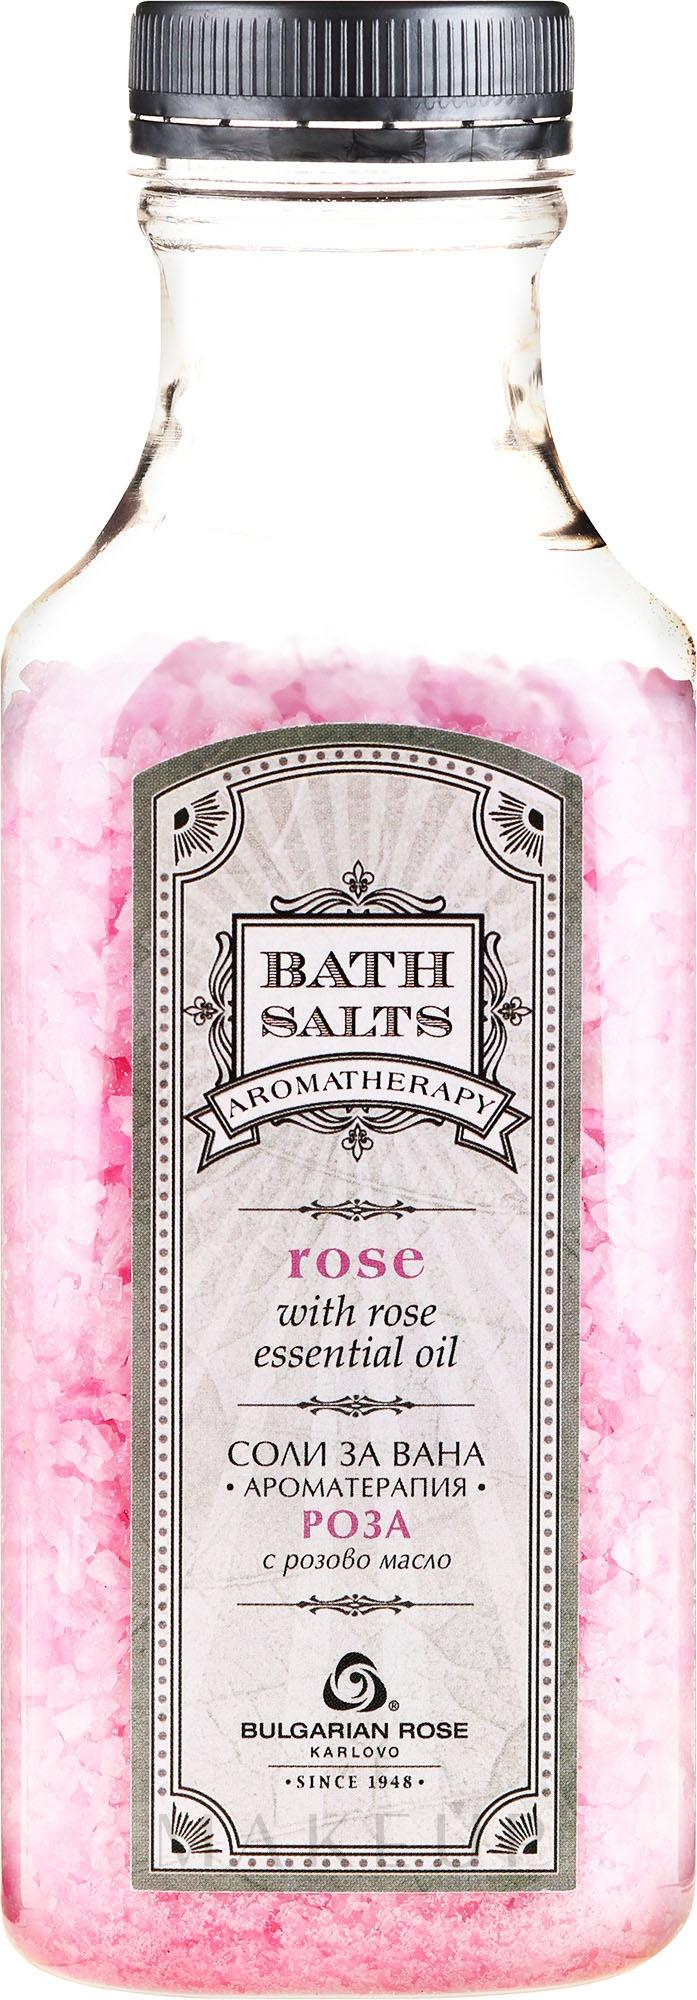 Badesalz mit Rosenöl und Rosenblüten - Bulgarian Rose Bath Salts Rose — Bild 440 g